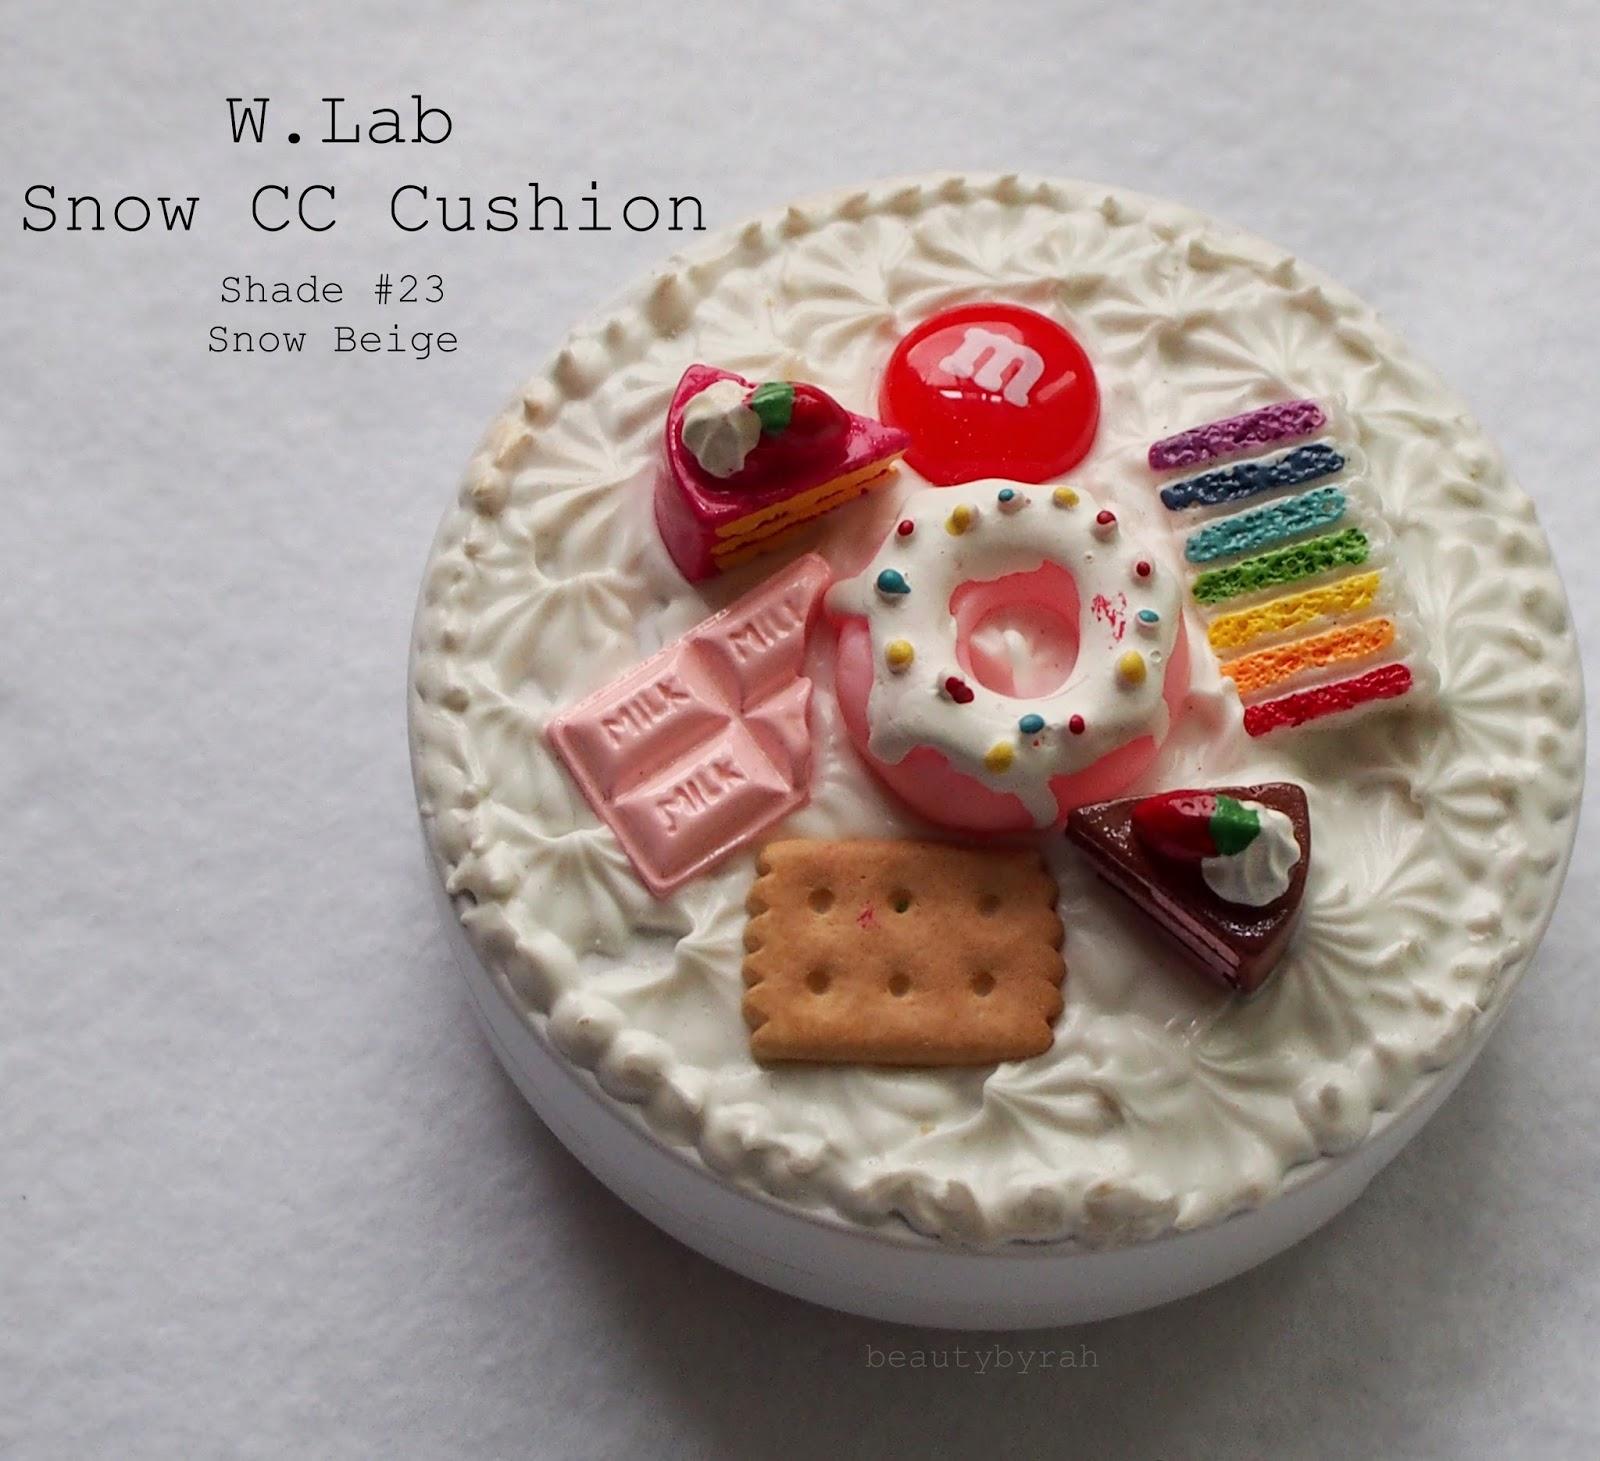 W.Lab Snow CC Cushion in #23 Snow Beige Review